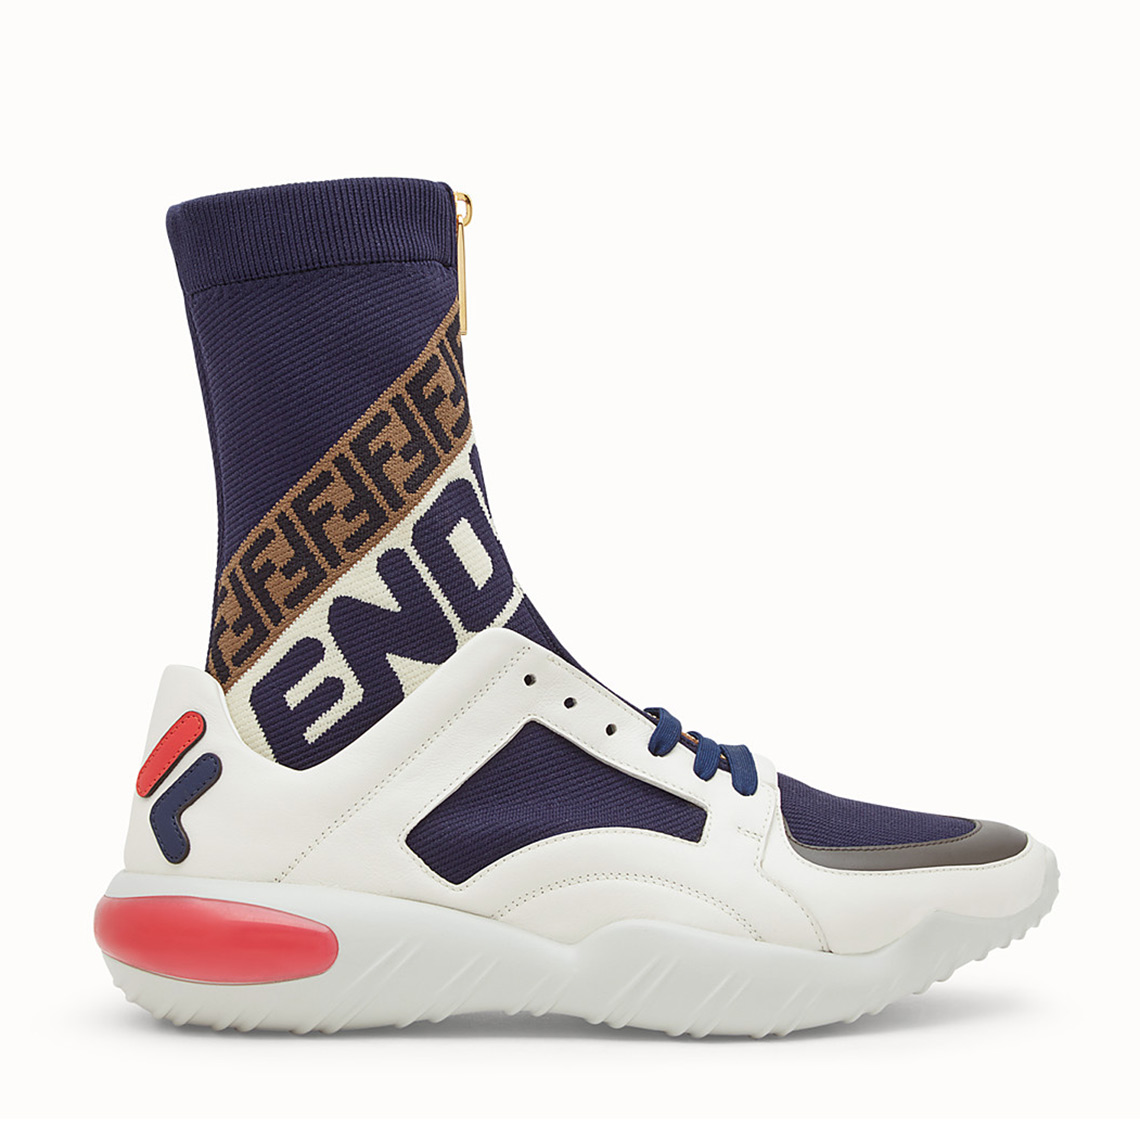 Fendi FILA Shoes Release Info + Where To Buy |